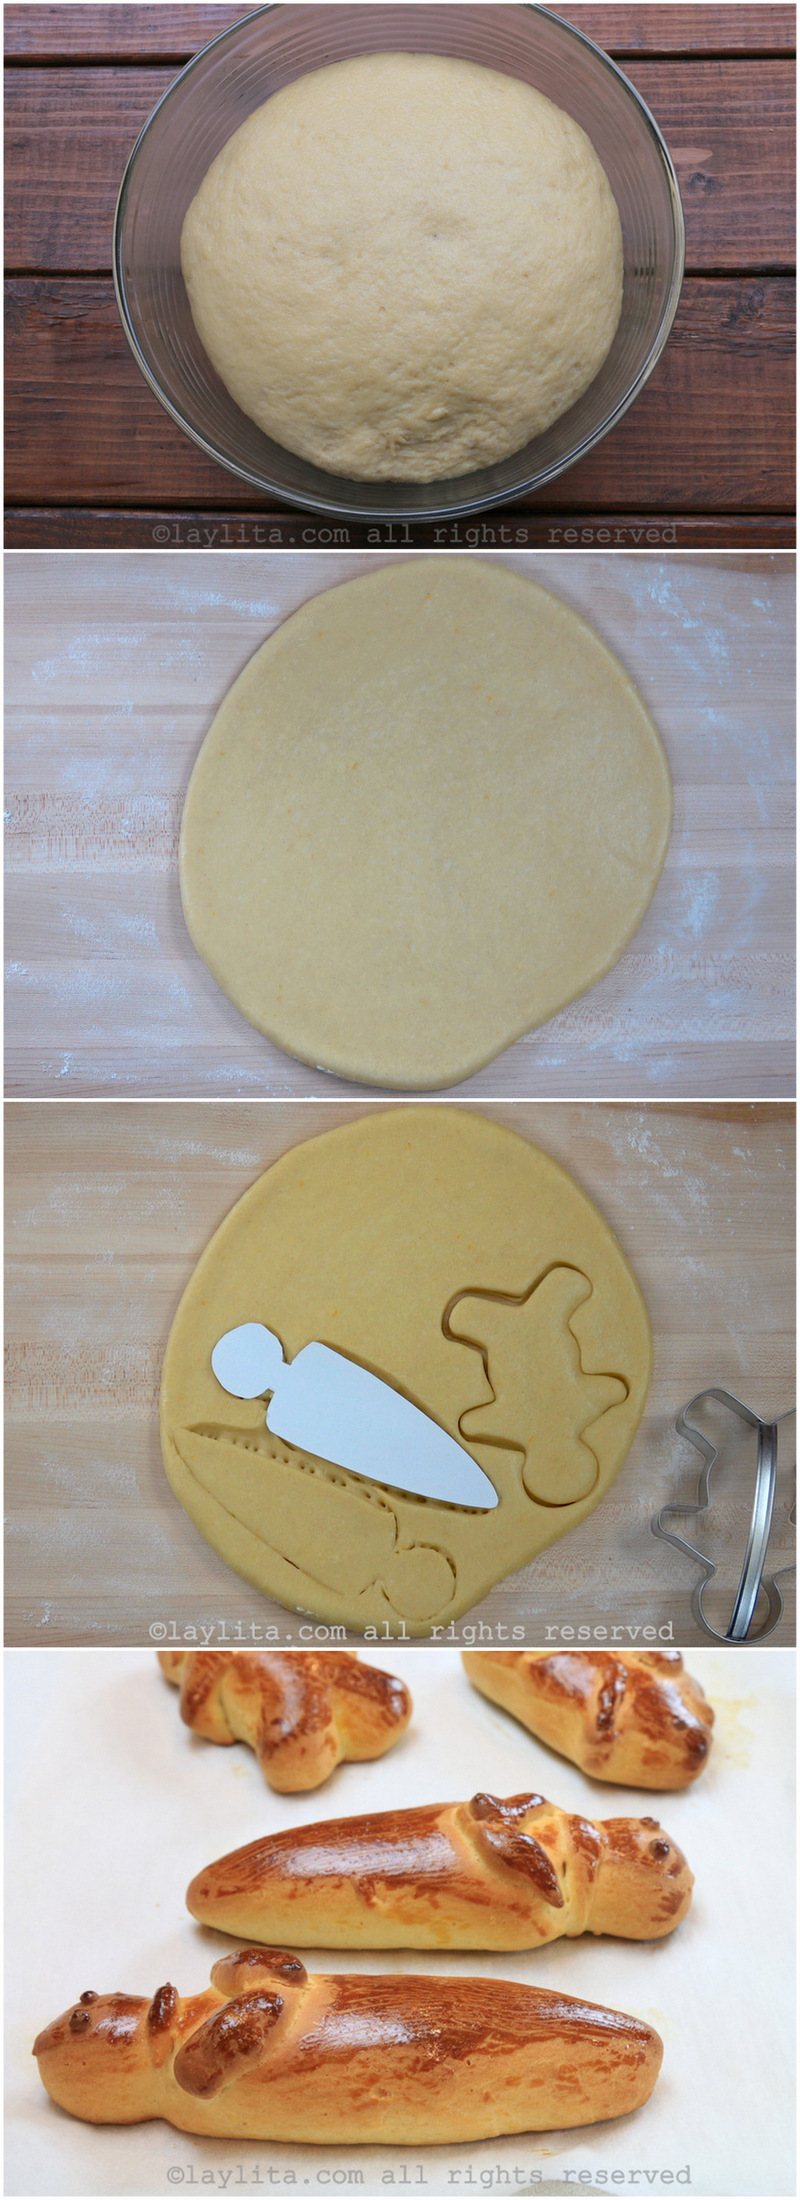 How to make Ecuadorian bread babies or guaguas de pan - simple method without a filling